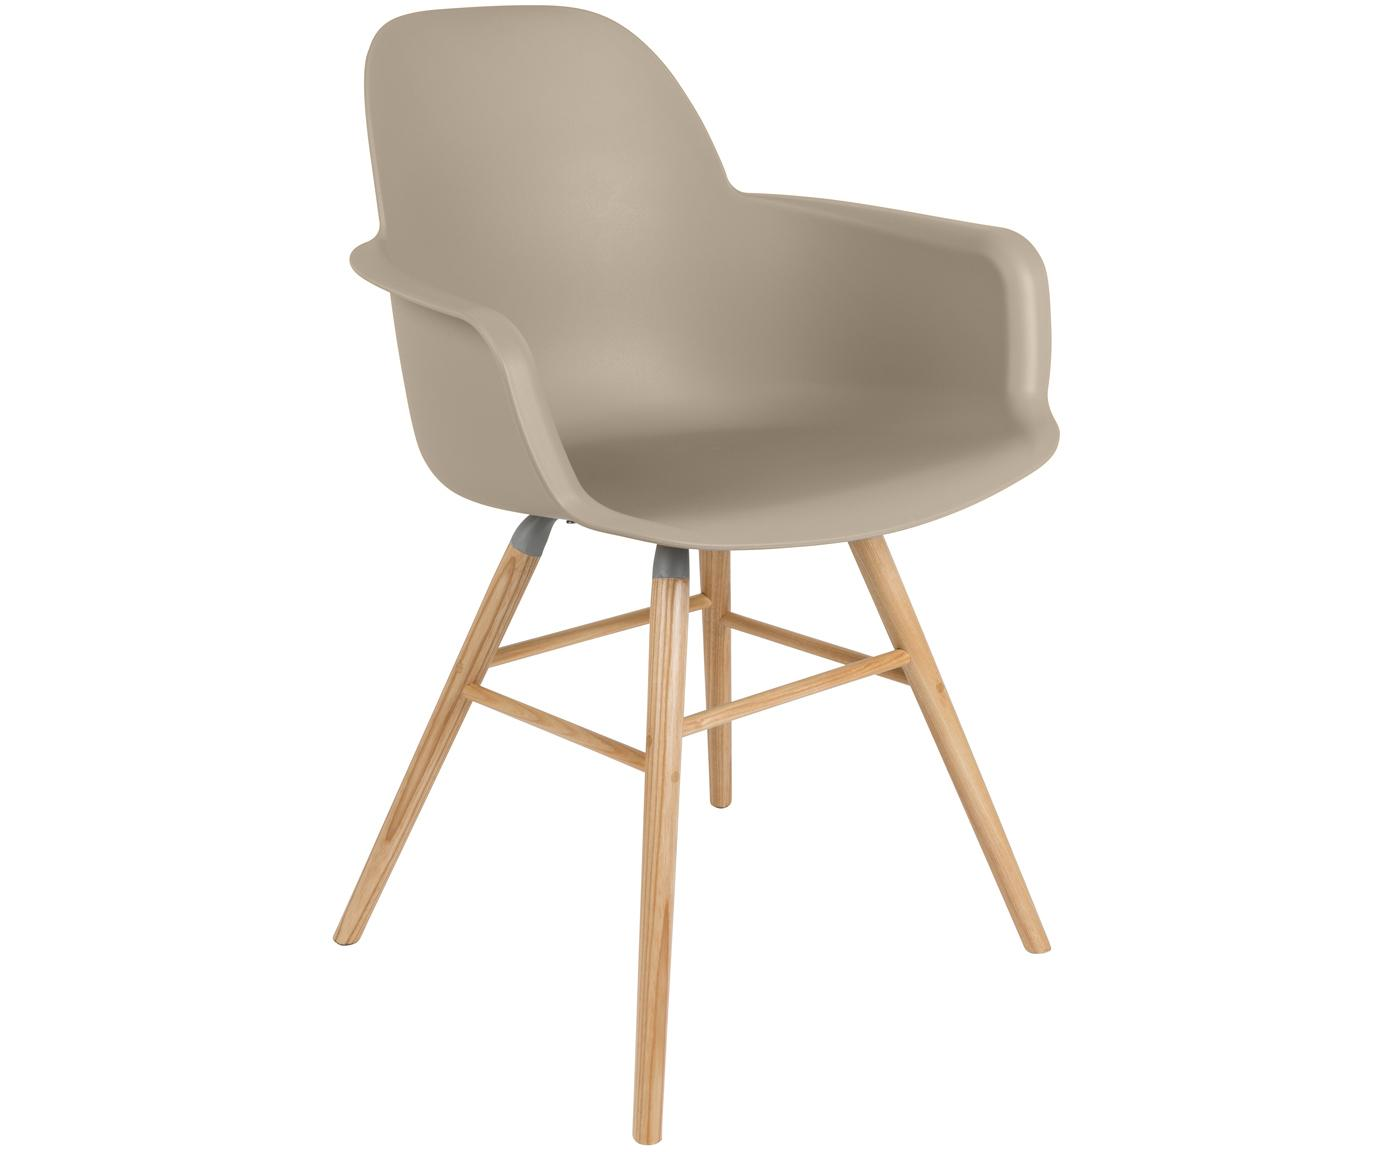 Sedia con braccioli Albert Kuip, Seduta: 100% polipropilene, Piedini: legno di frassino, Taupe, Larg. 59 x Prof. 55 cm